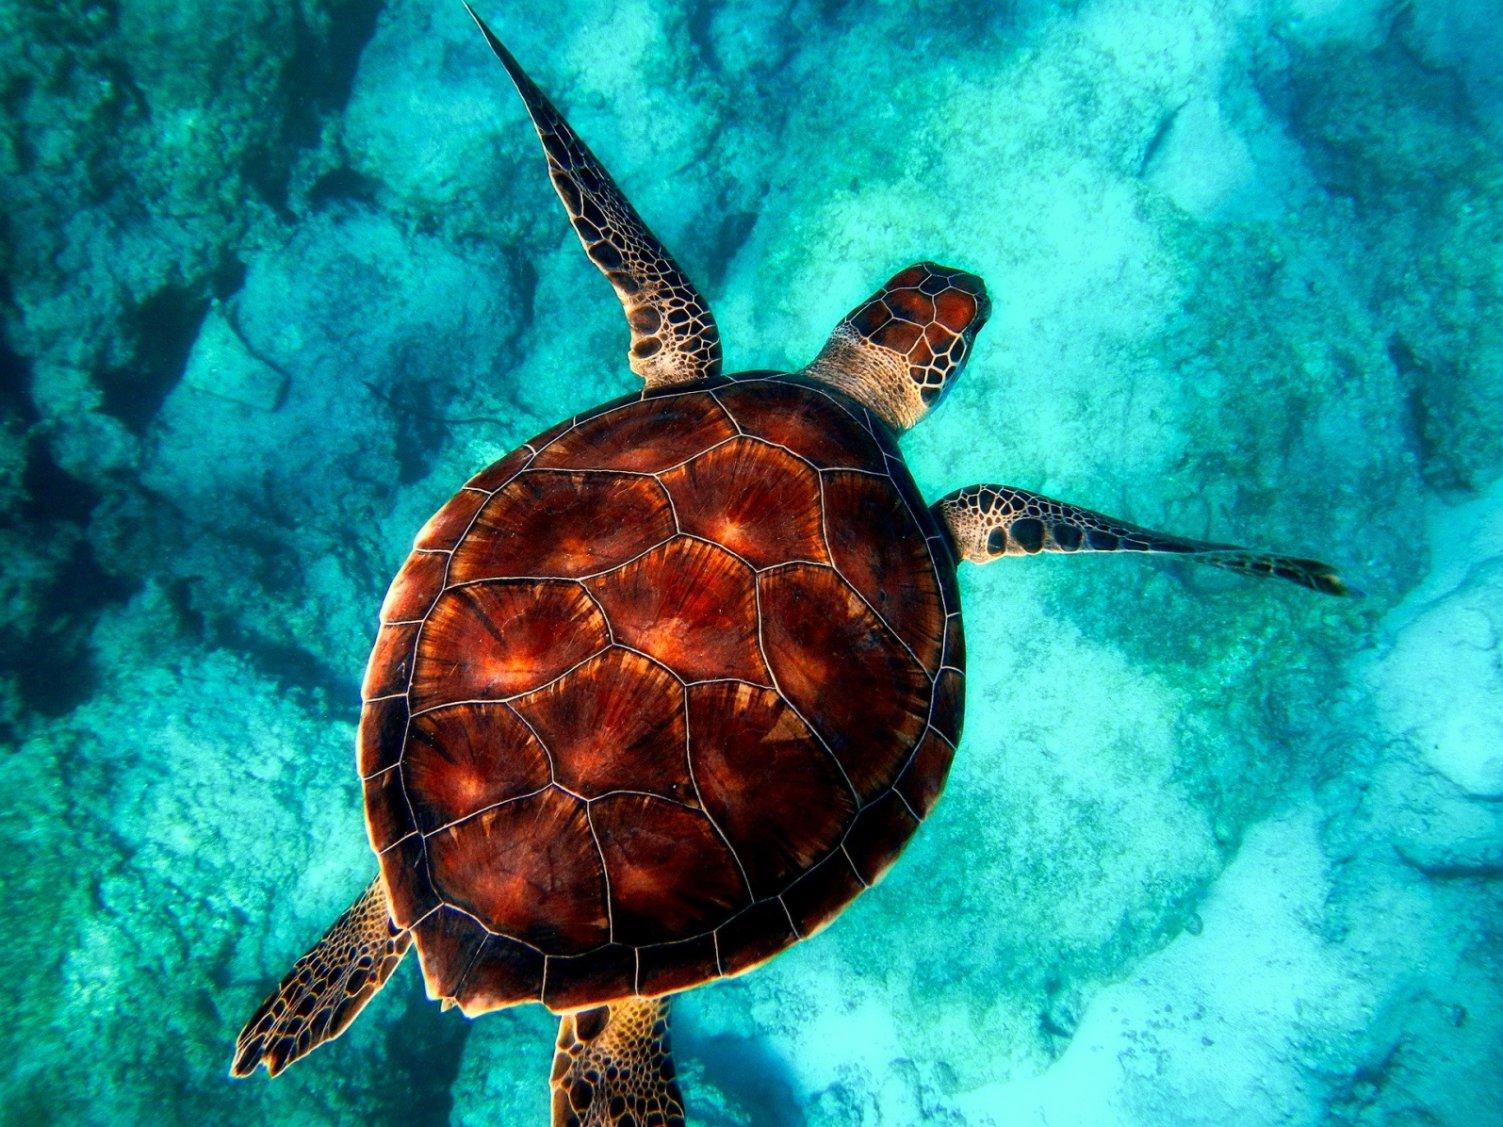 Turtle in water - Original image